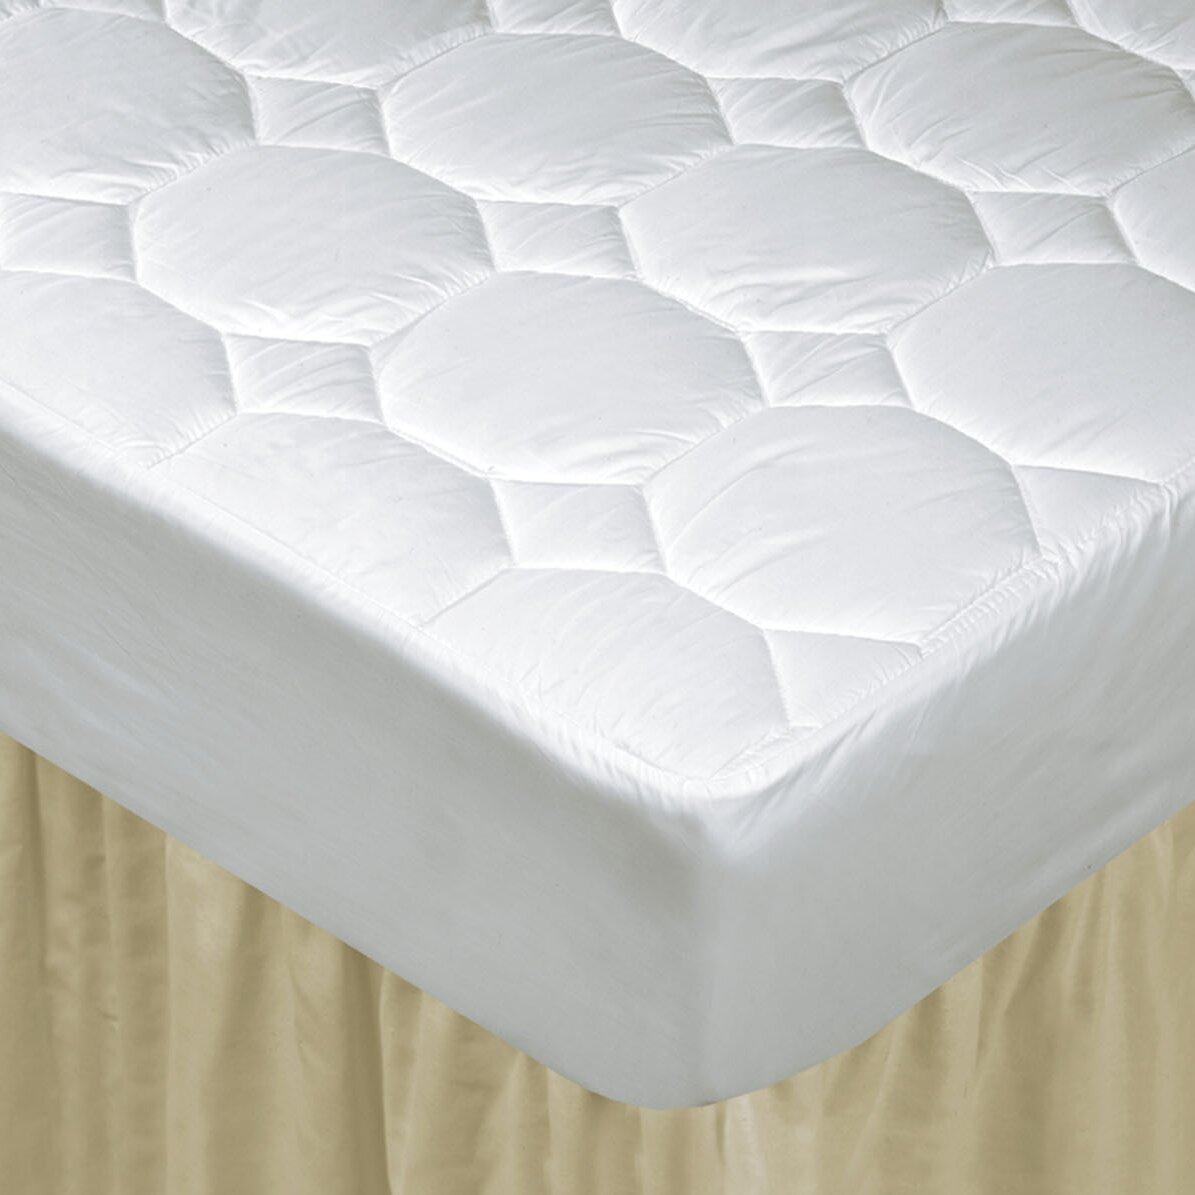 DownTown pany Luxury Cotton Mattress Pad & Reviews